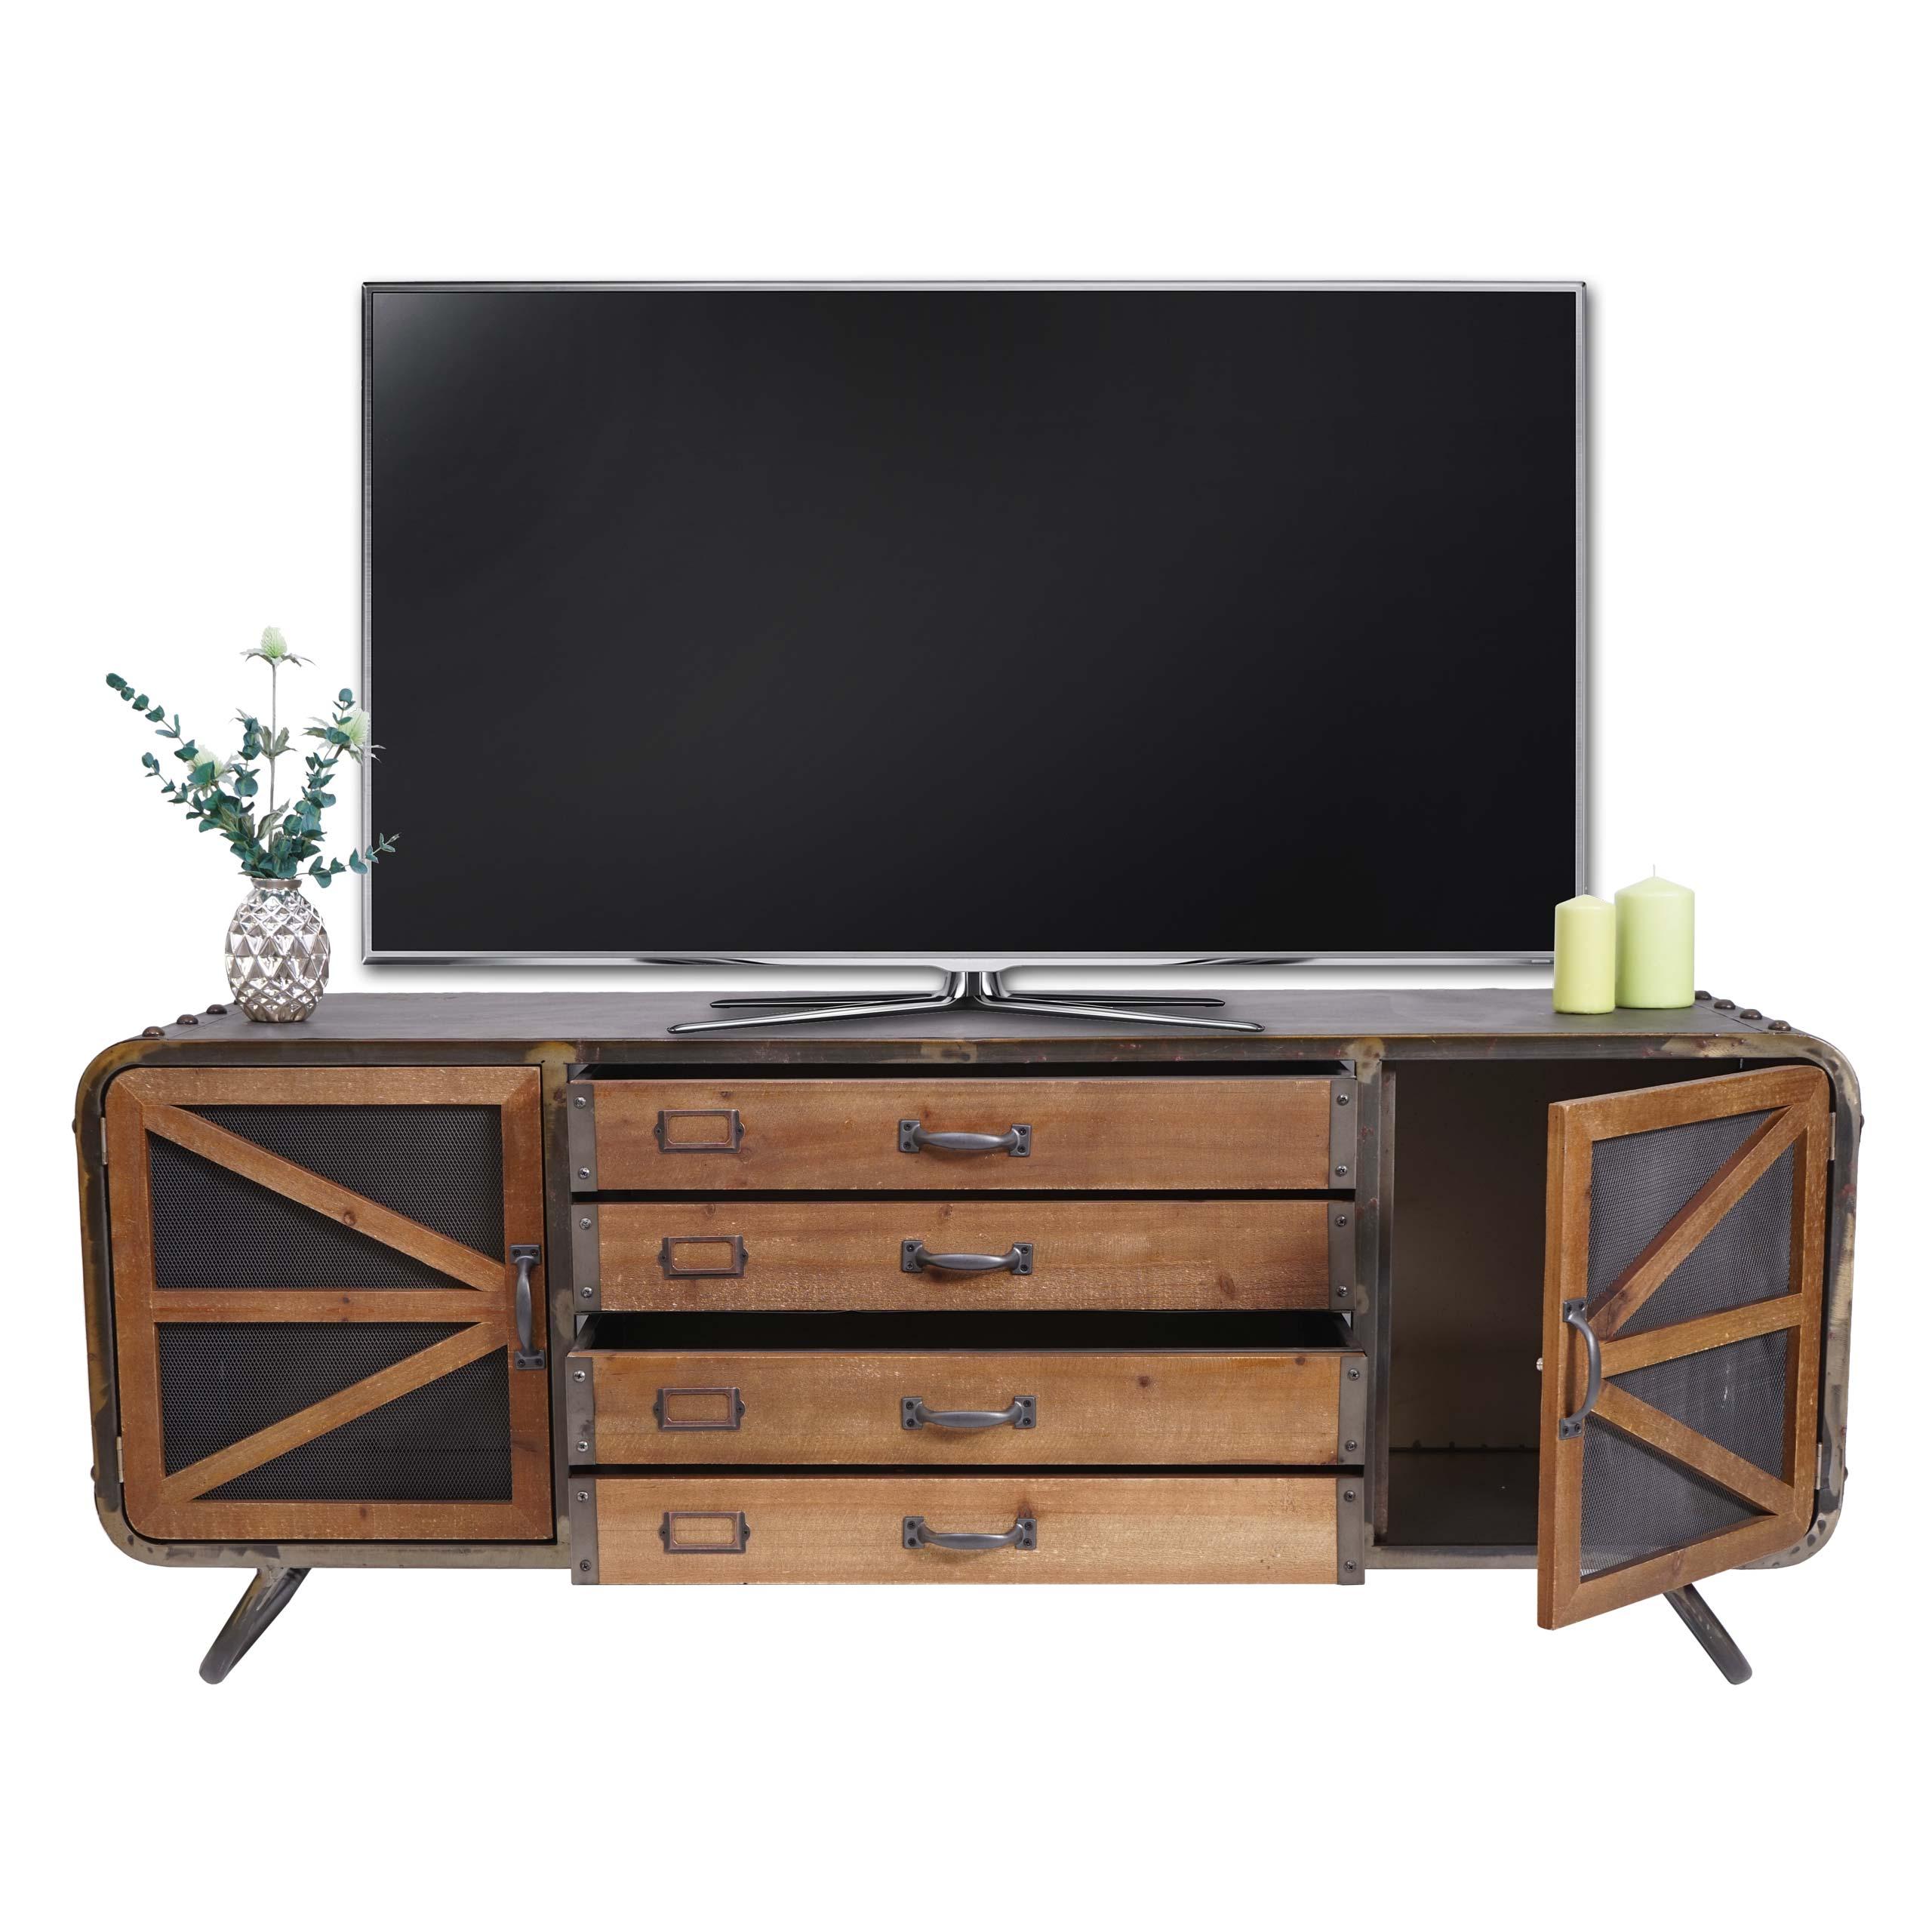 Mendler TV-Rack HWC-F91, Fernsehtisch Lowboard Kommode, Industrial Kommode Tanne Holz Metall 55x139x41cm, br 70612